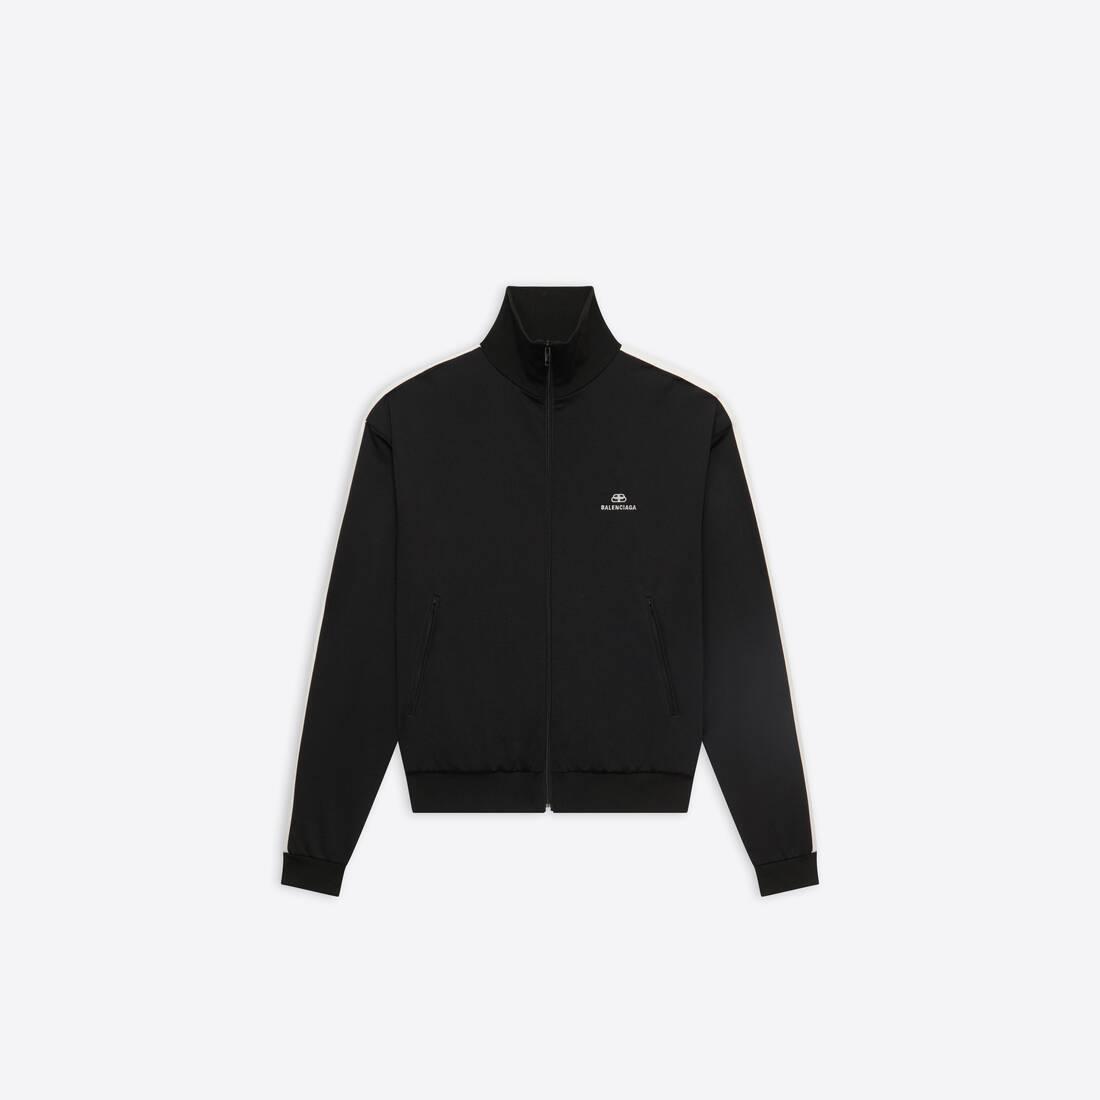 Display zoomed version of zip-up jacket 1